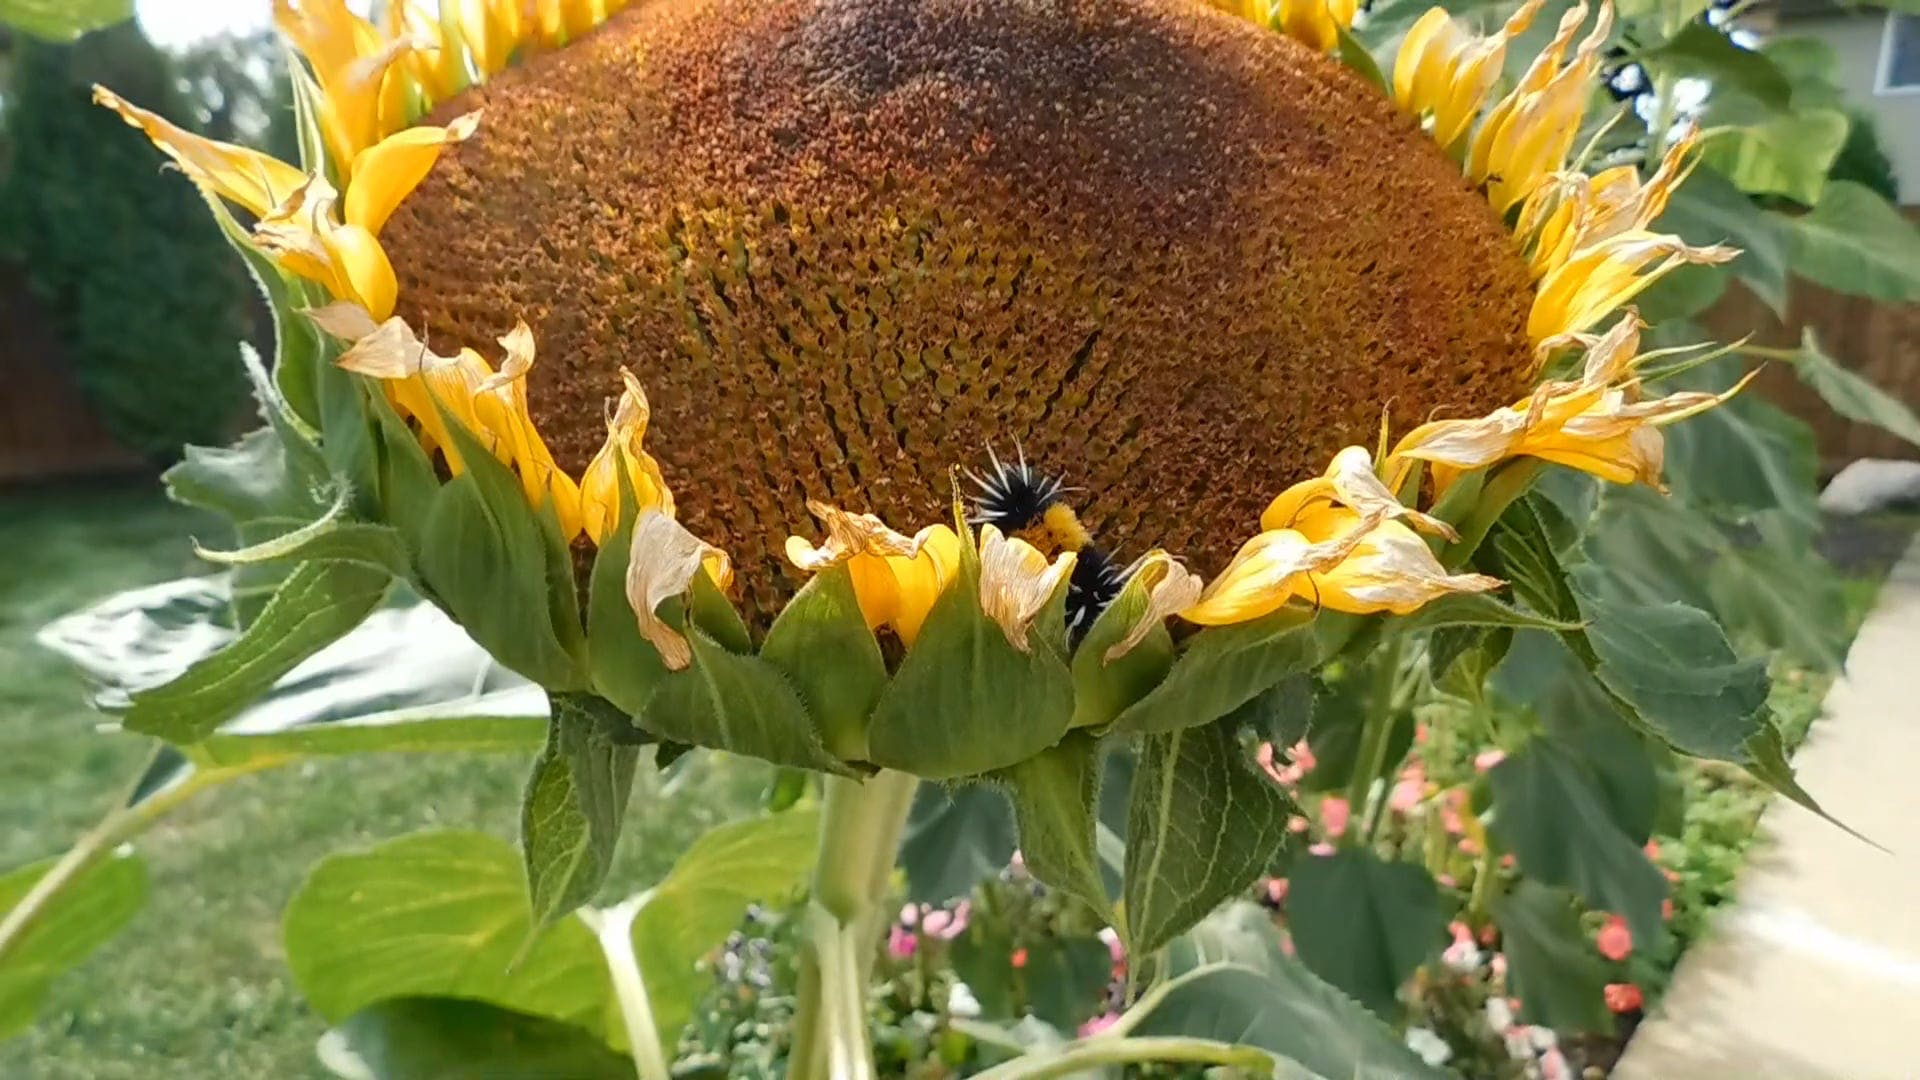 Tussock Moth Caterpillar In a Sunflower